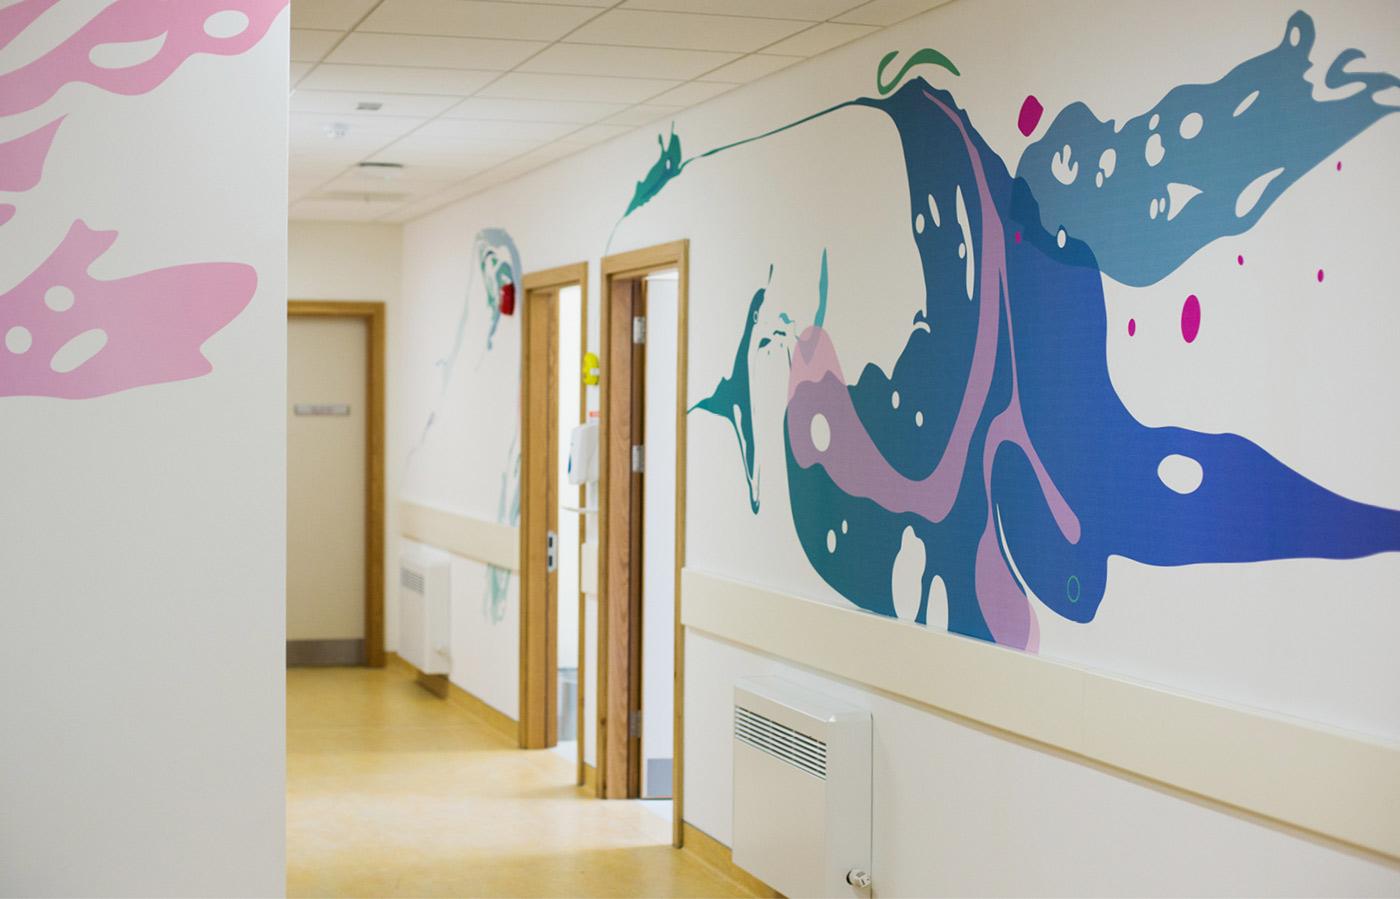 University Hospital Limerick spatial design in cystic fibrosis unit